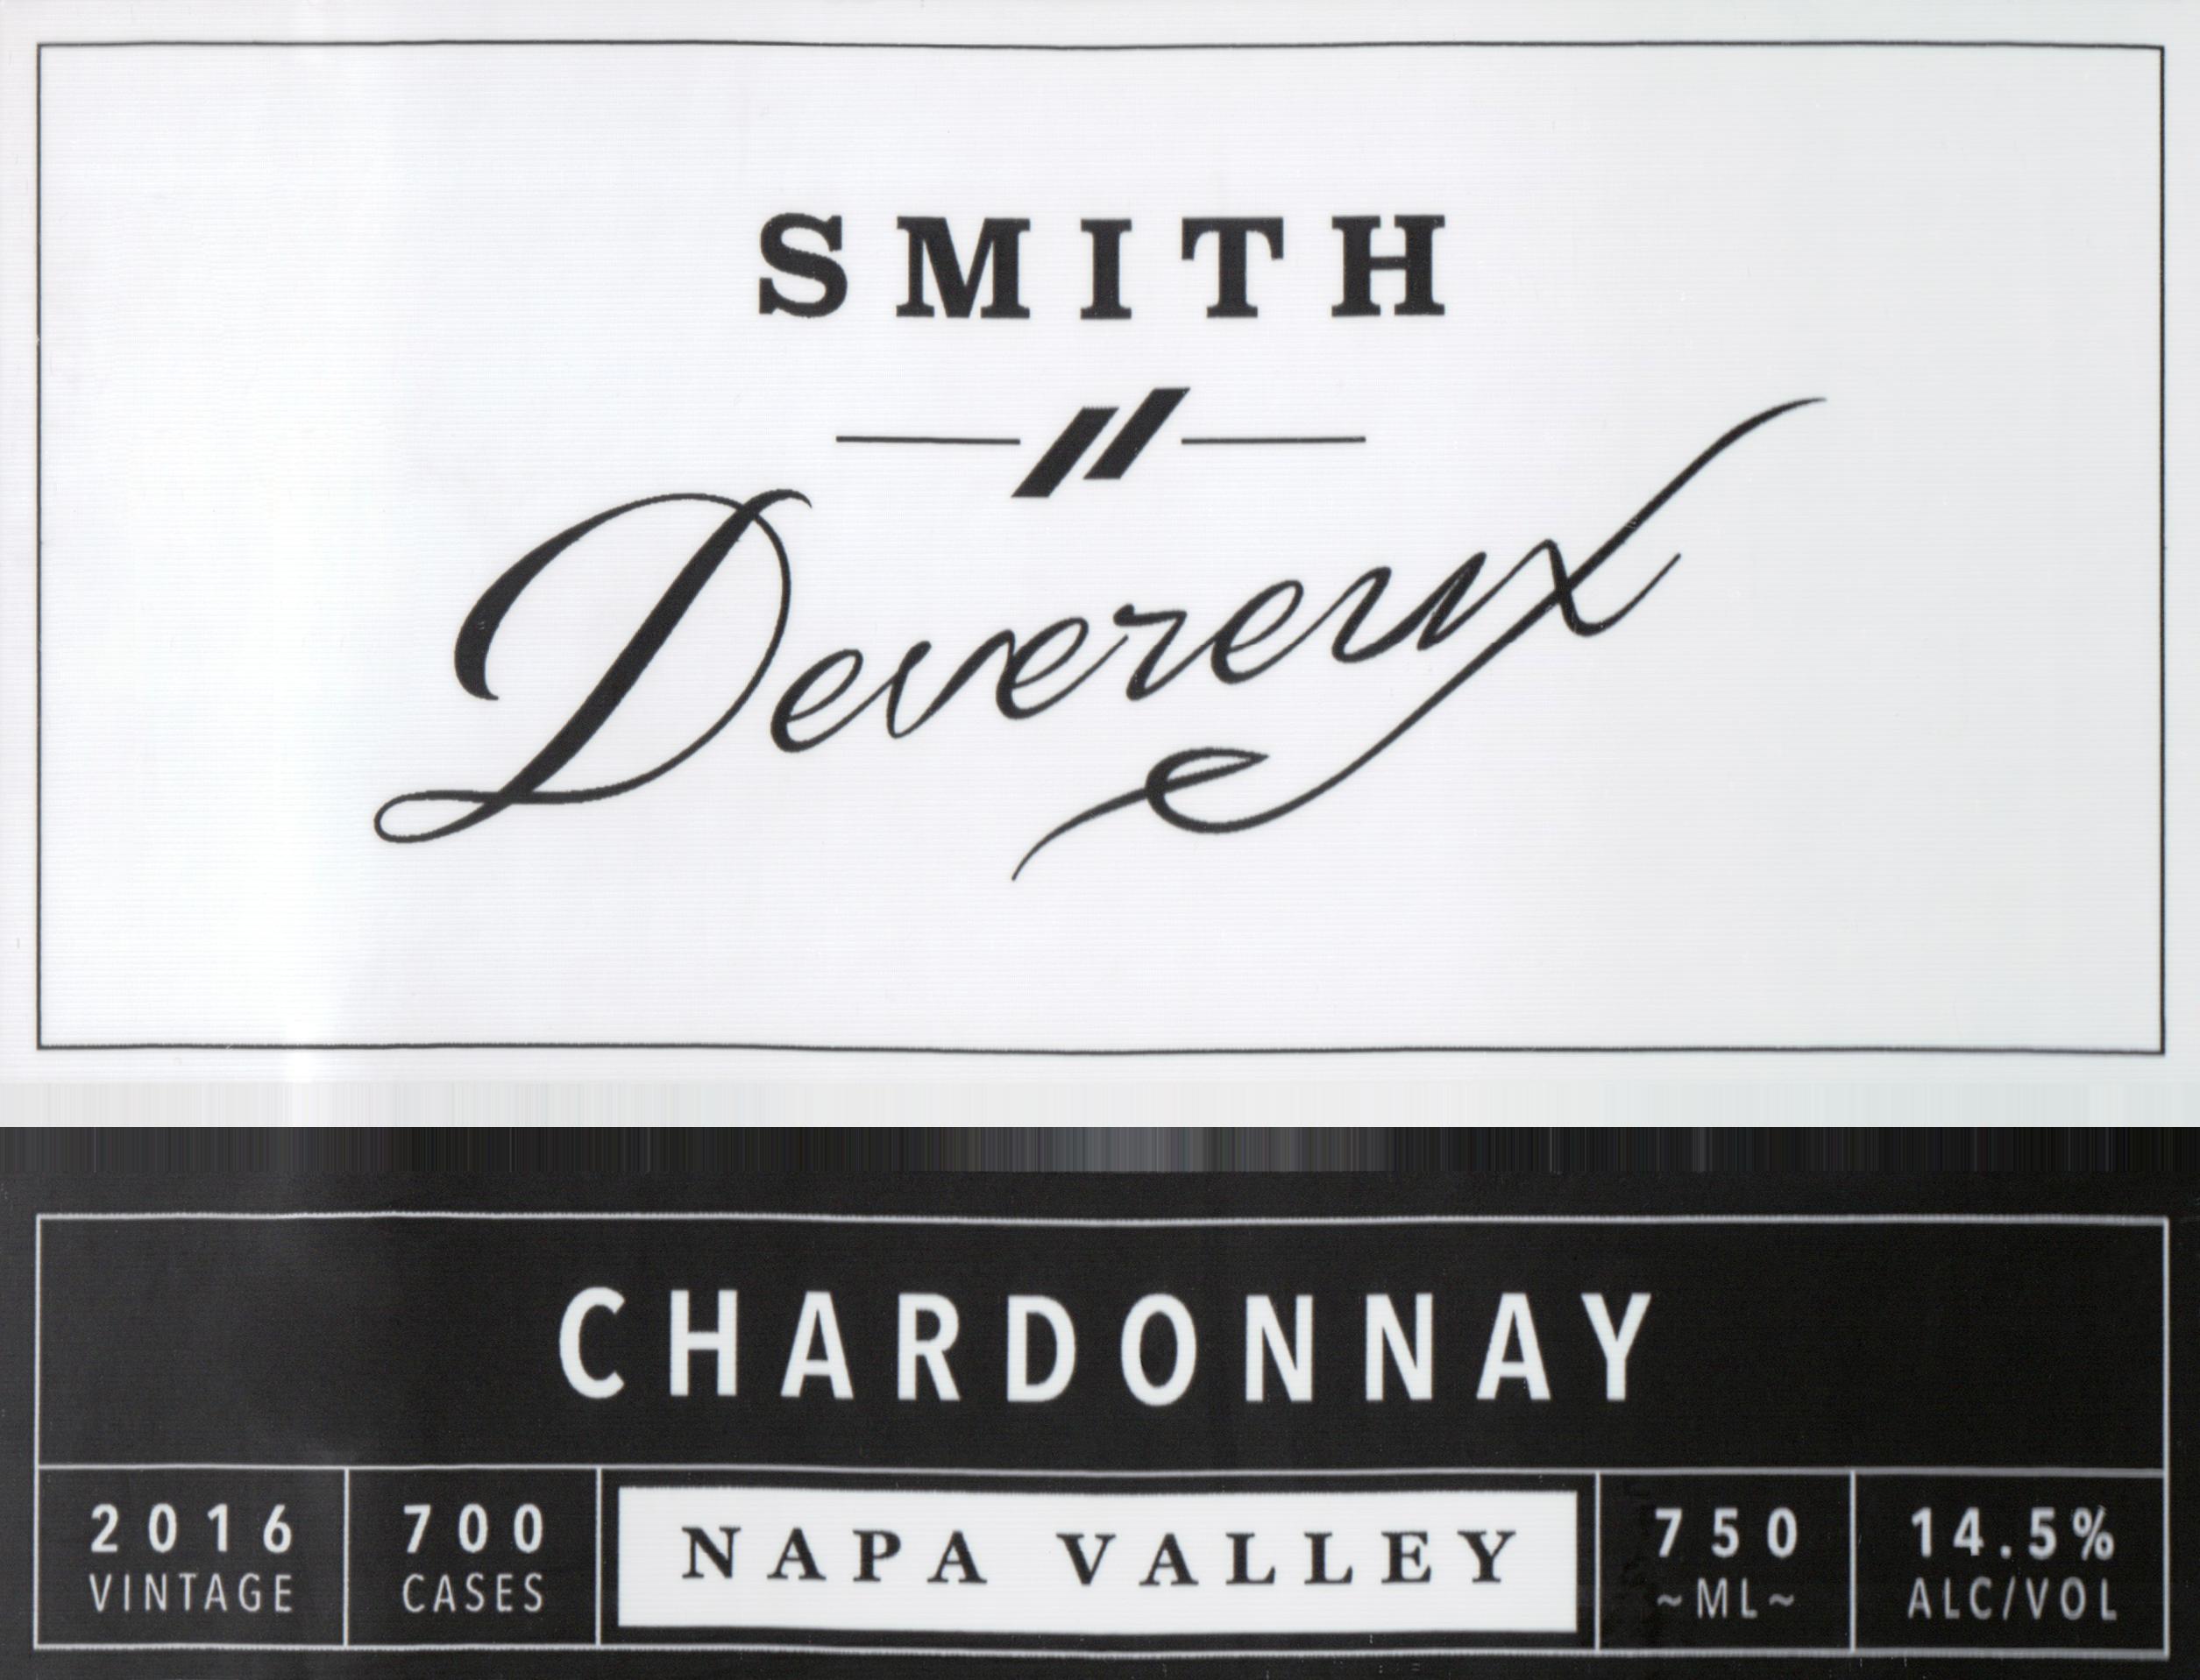 Smith & Devereux Chardonnay Napa Valley 2016